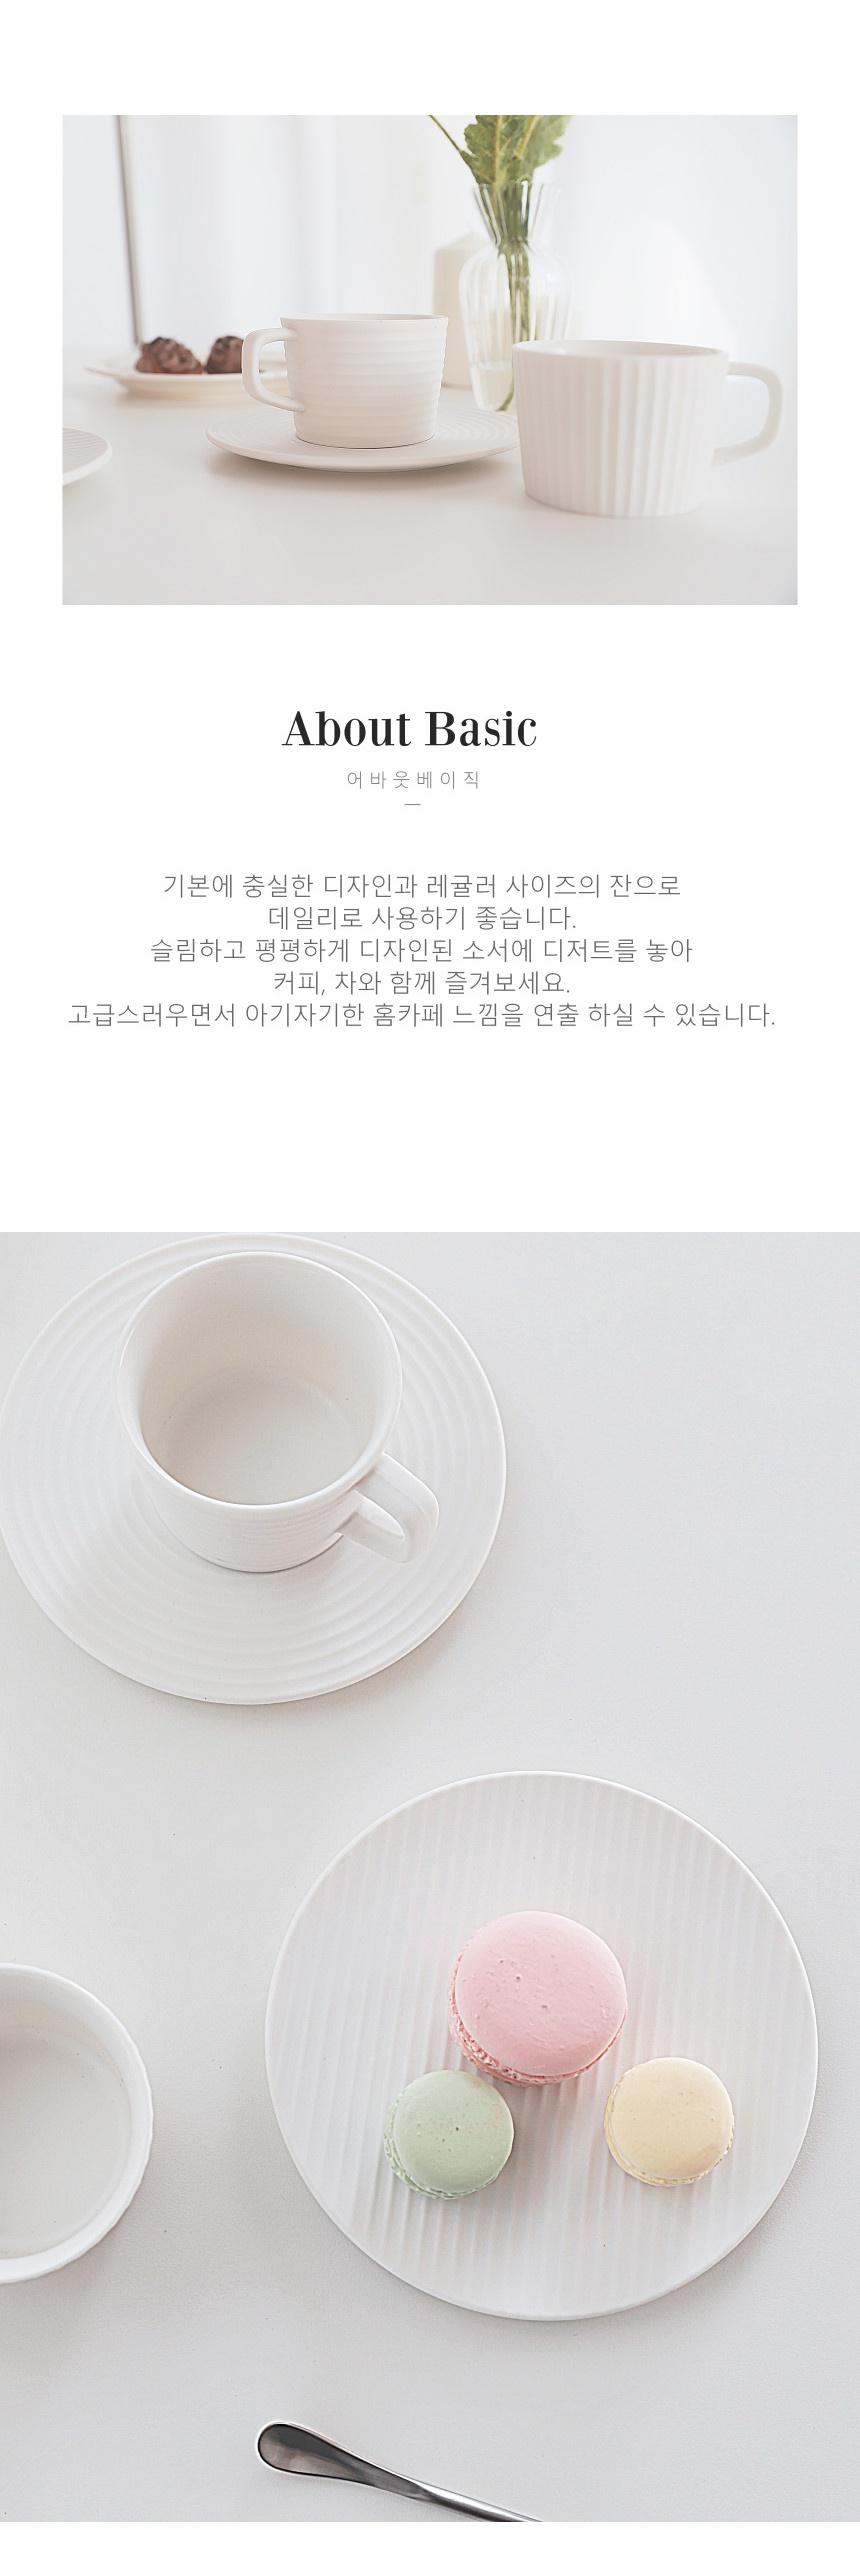 white_basic_cup_03.jpg